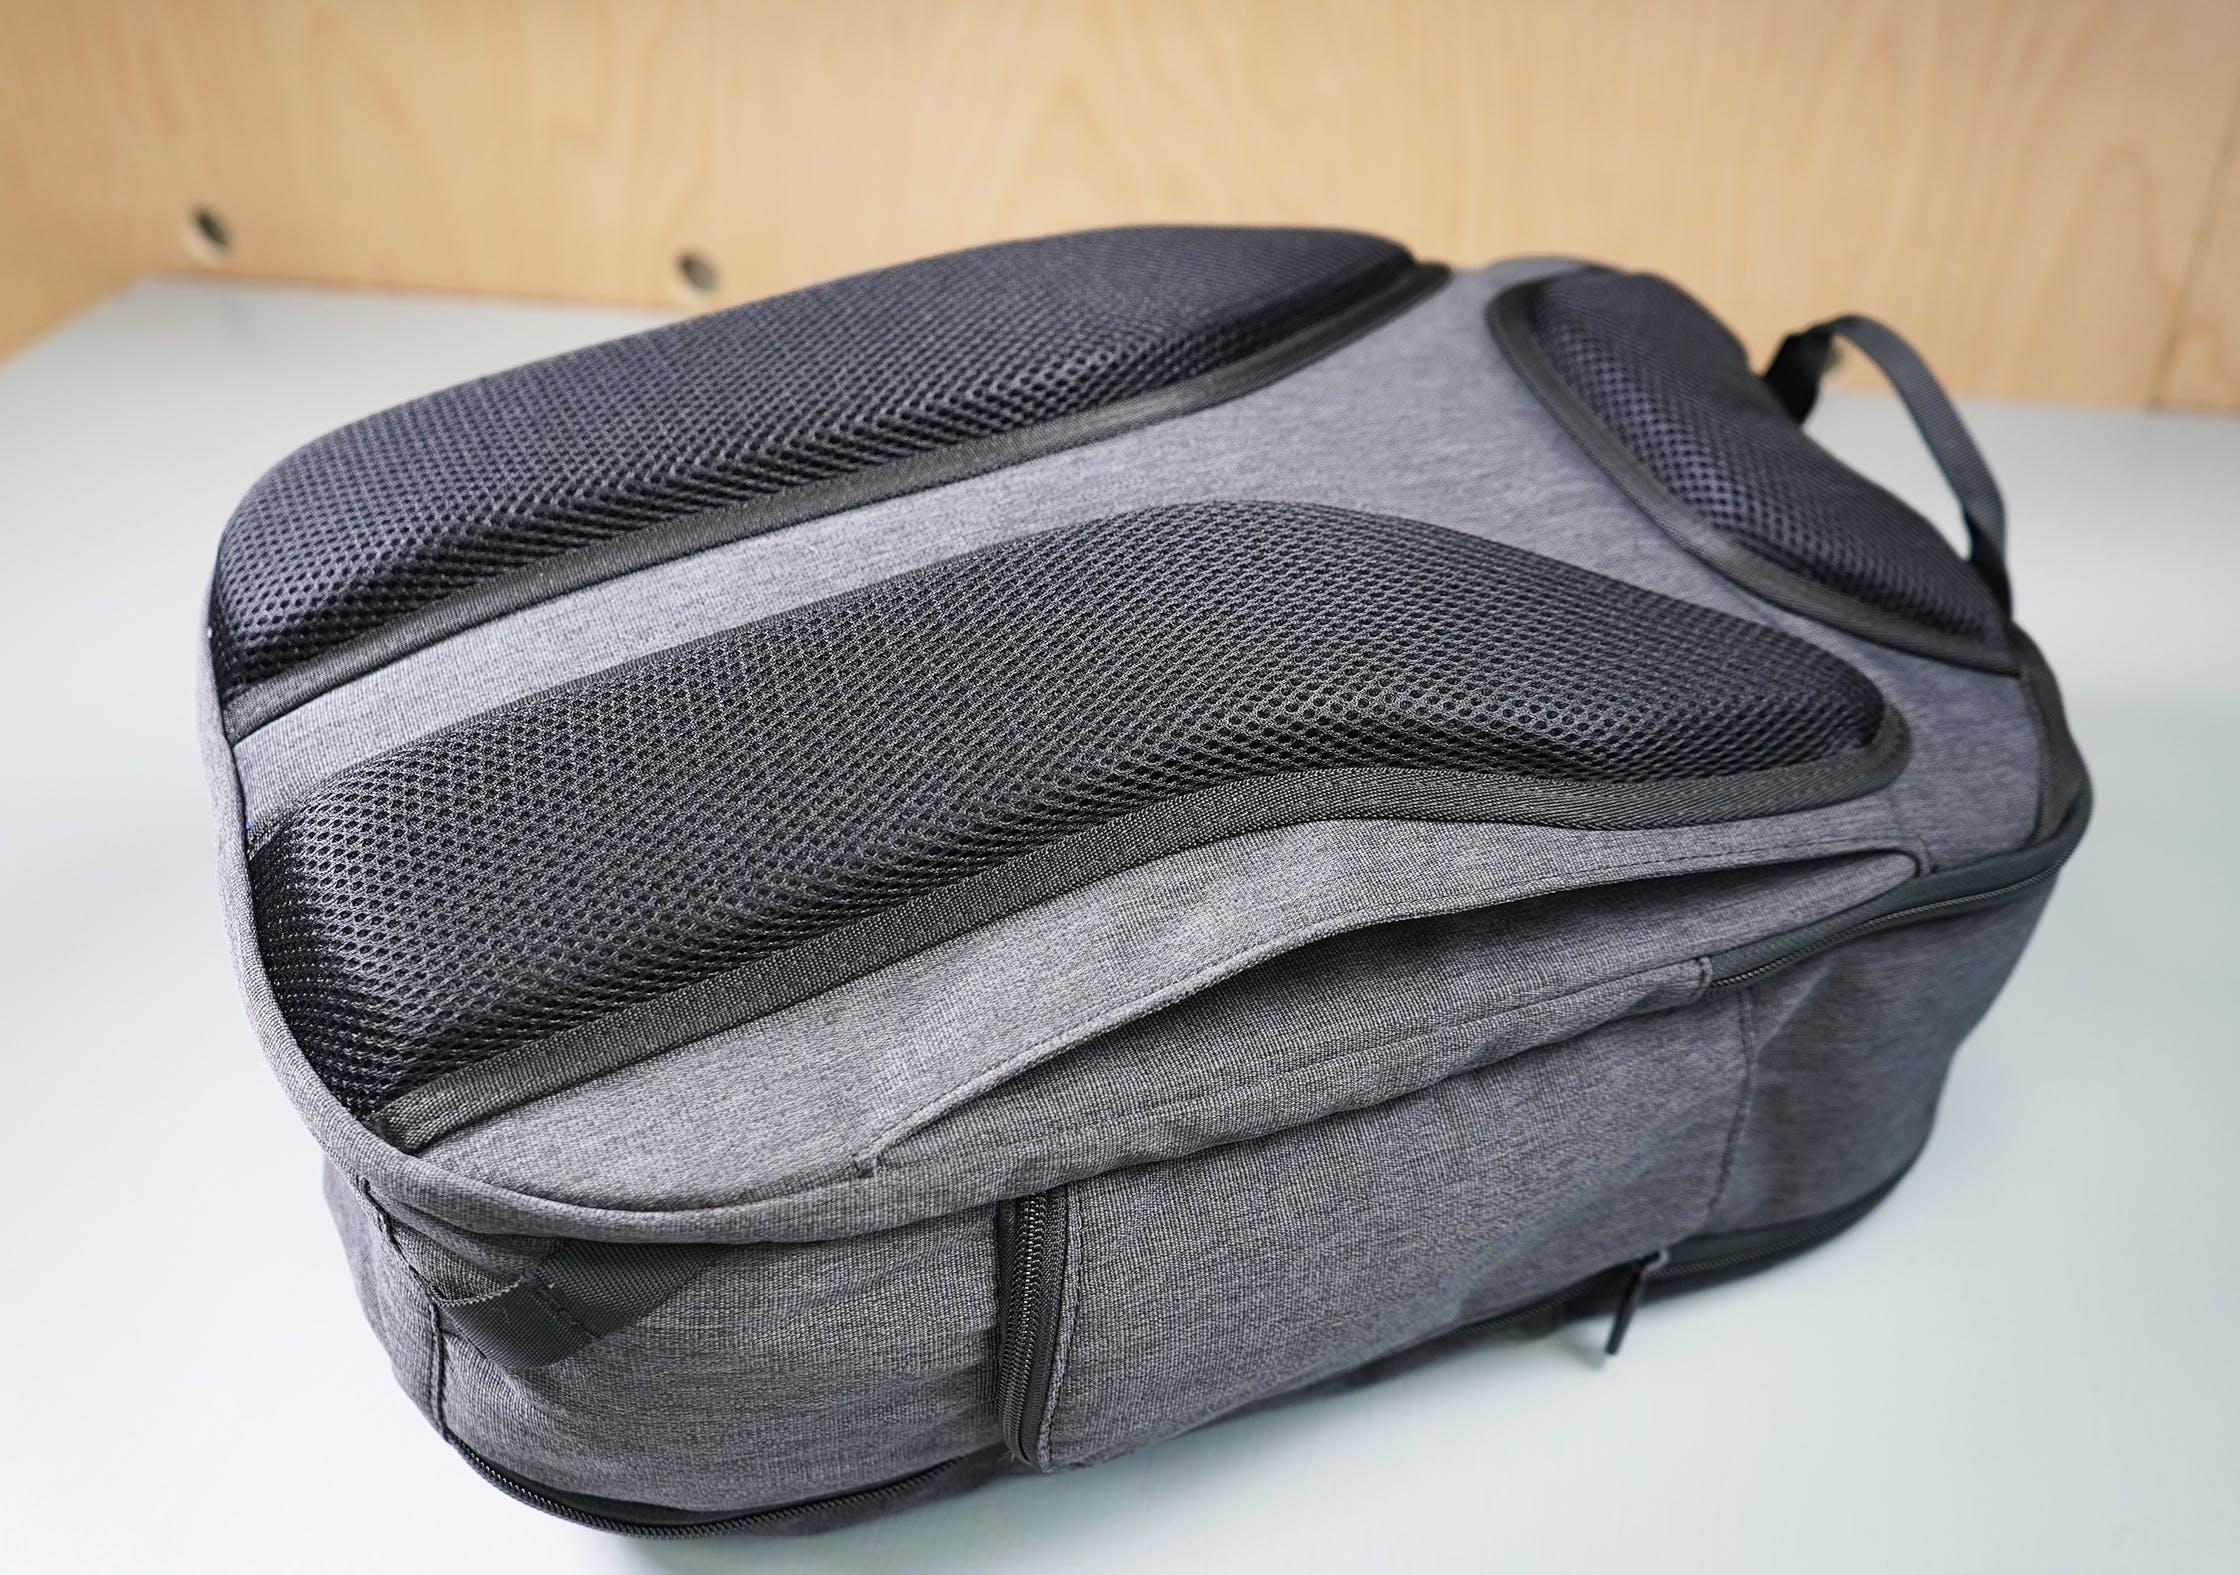 Tortuga Setout Laptop Backpack Back Panel